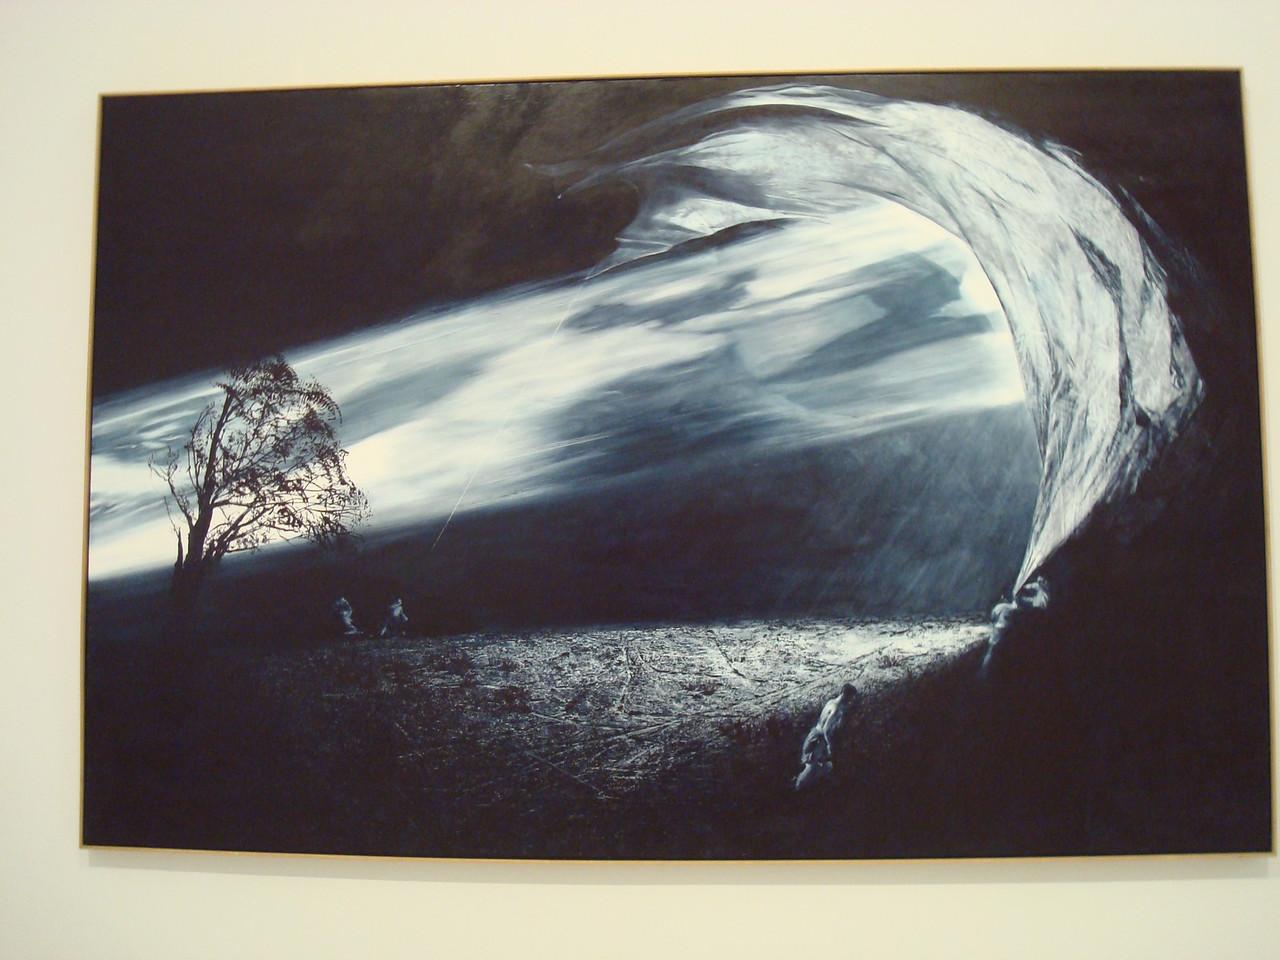 Interception, Mark Tansey (Smithsonian American Art Museum)